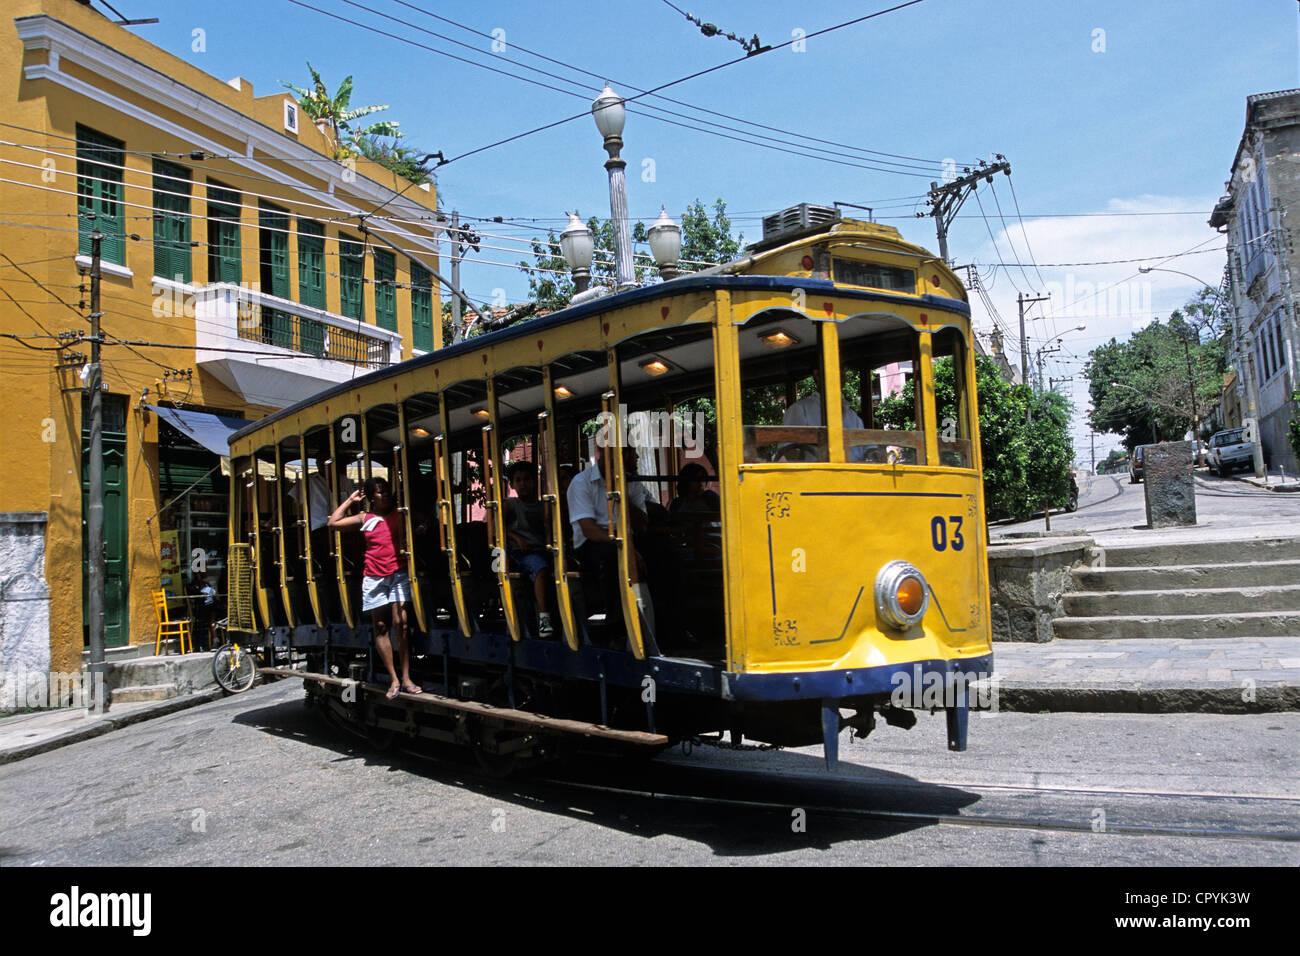 Brazil, Rio de Janeiro, Santa Teresa District, yellow tramway going to downtown - Stock Image